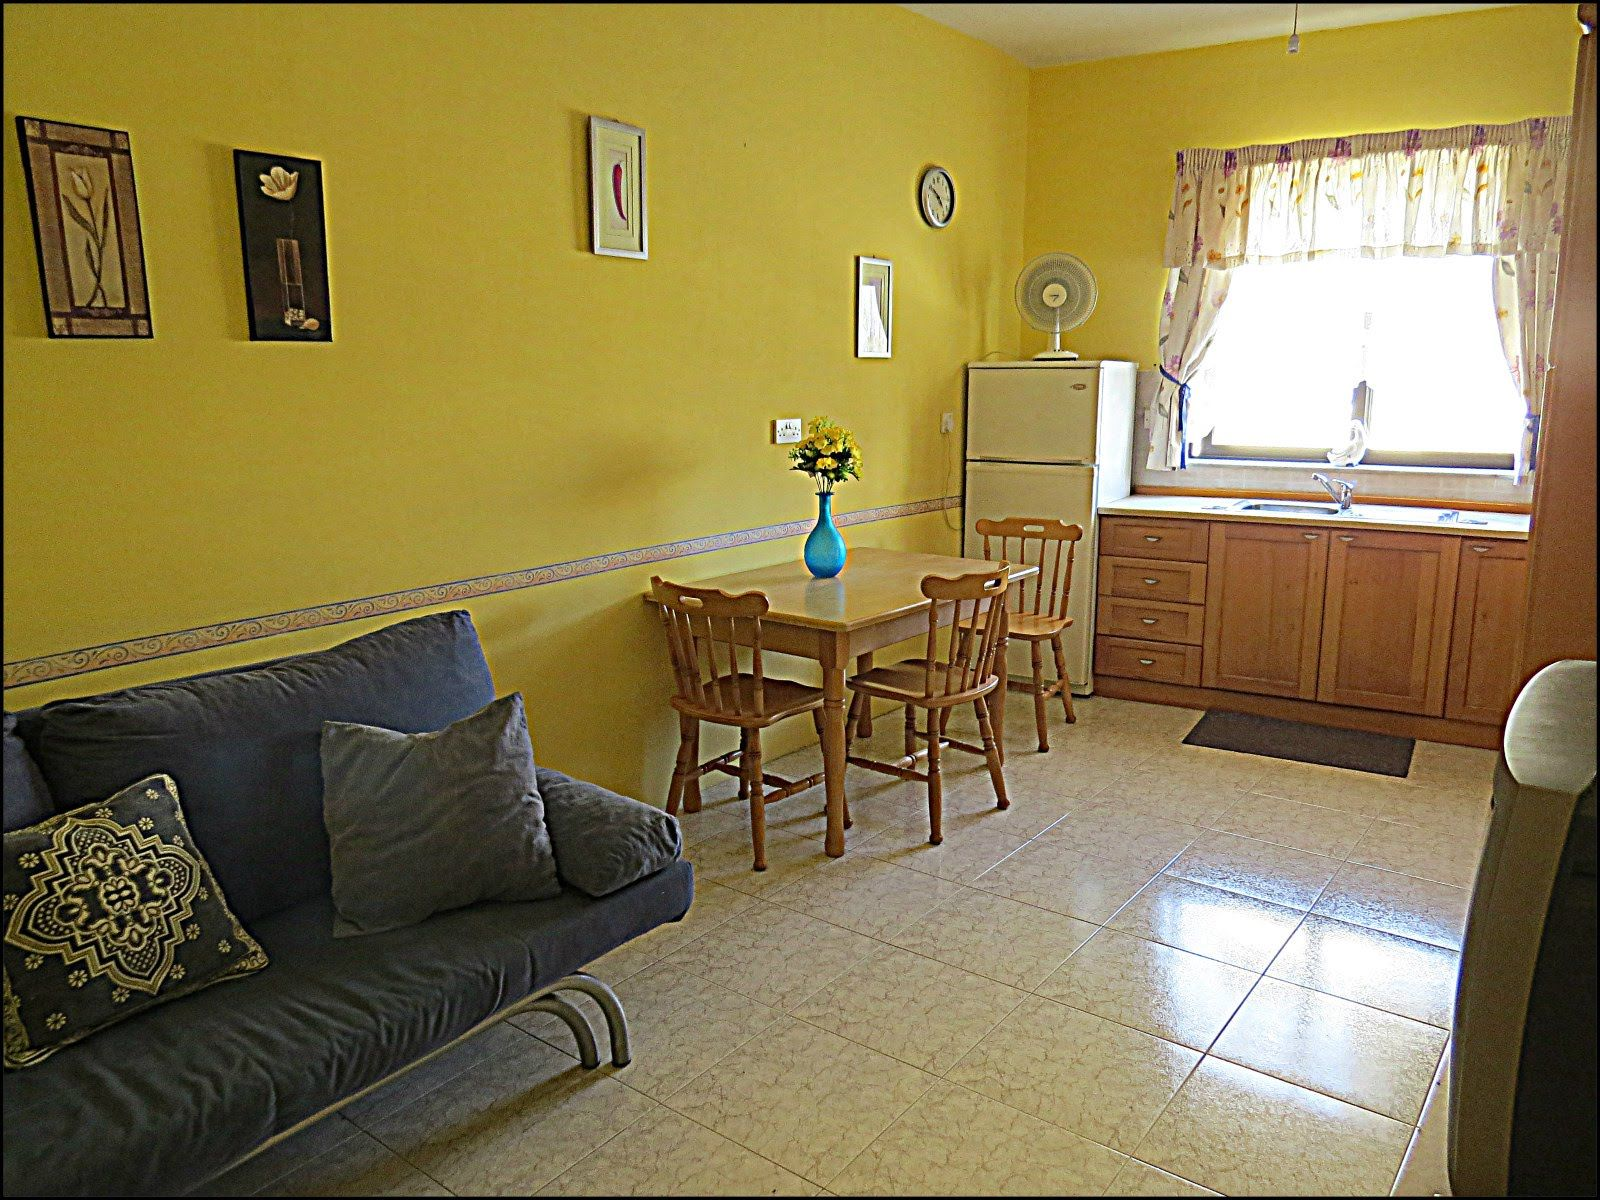 Malta Property For Sale   1 Bedroom Apartment   Swatar   1 ...